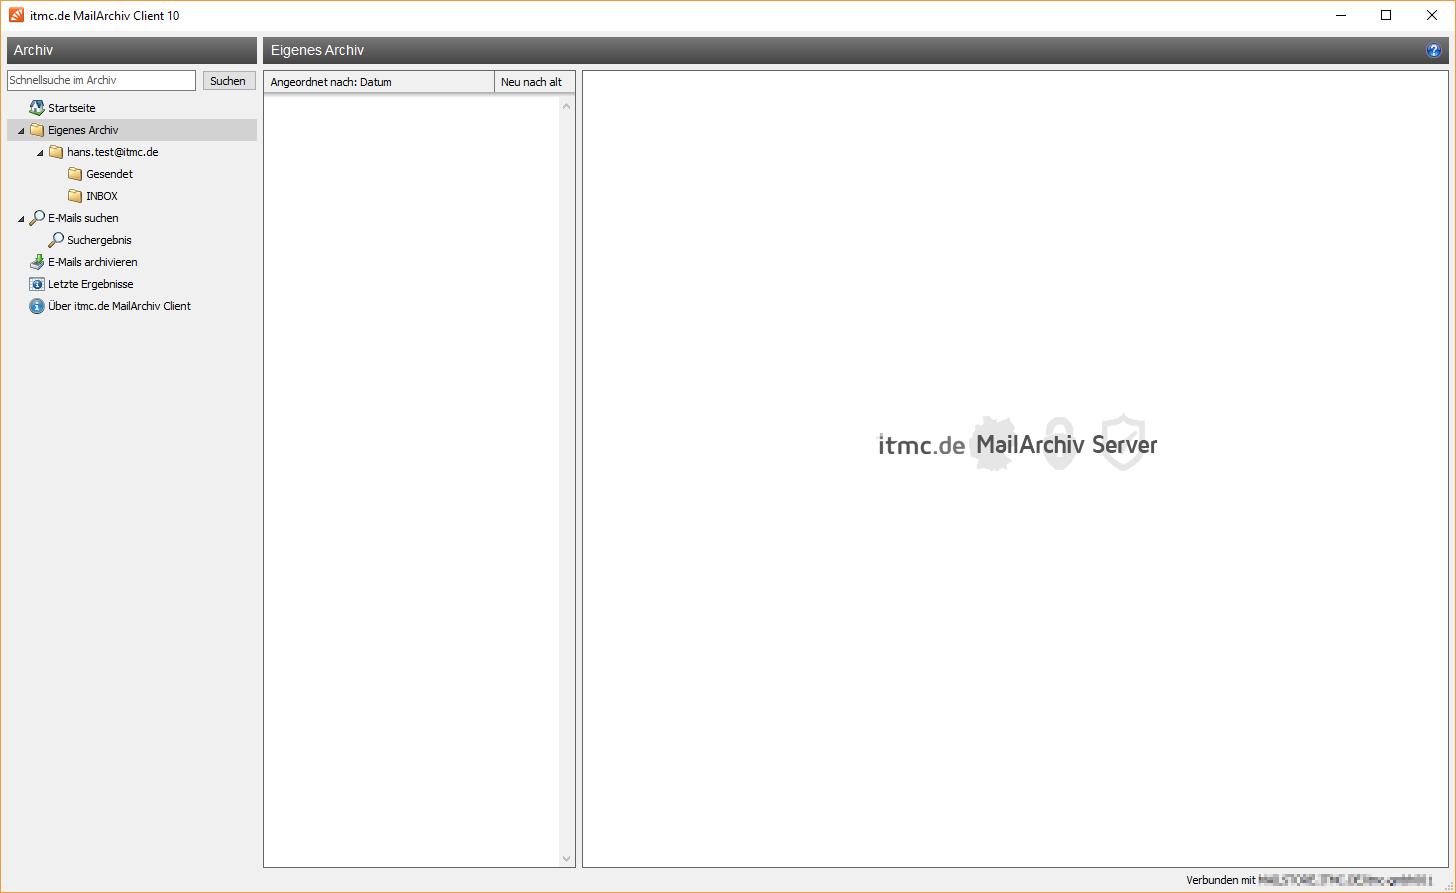 itmc.de MailArchiv Client Archiv von hans.test